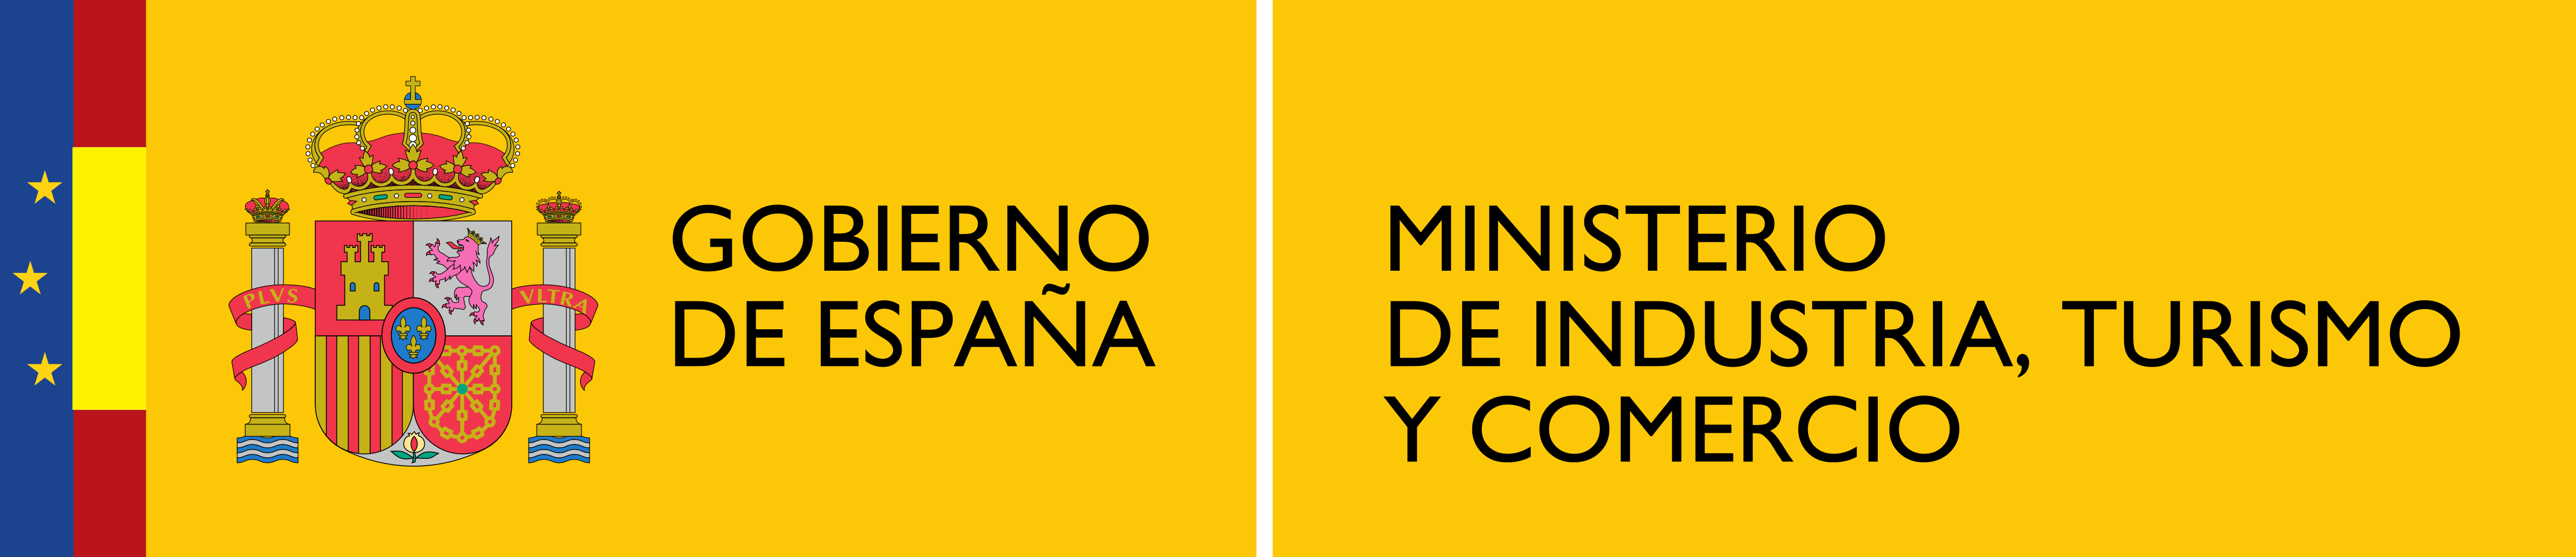 file logotipo del ministerio de industria turismo y